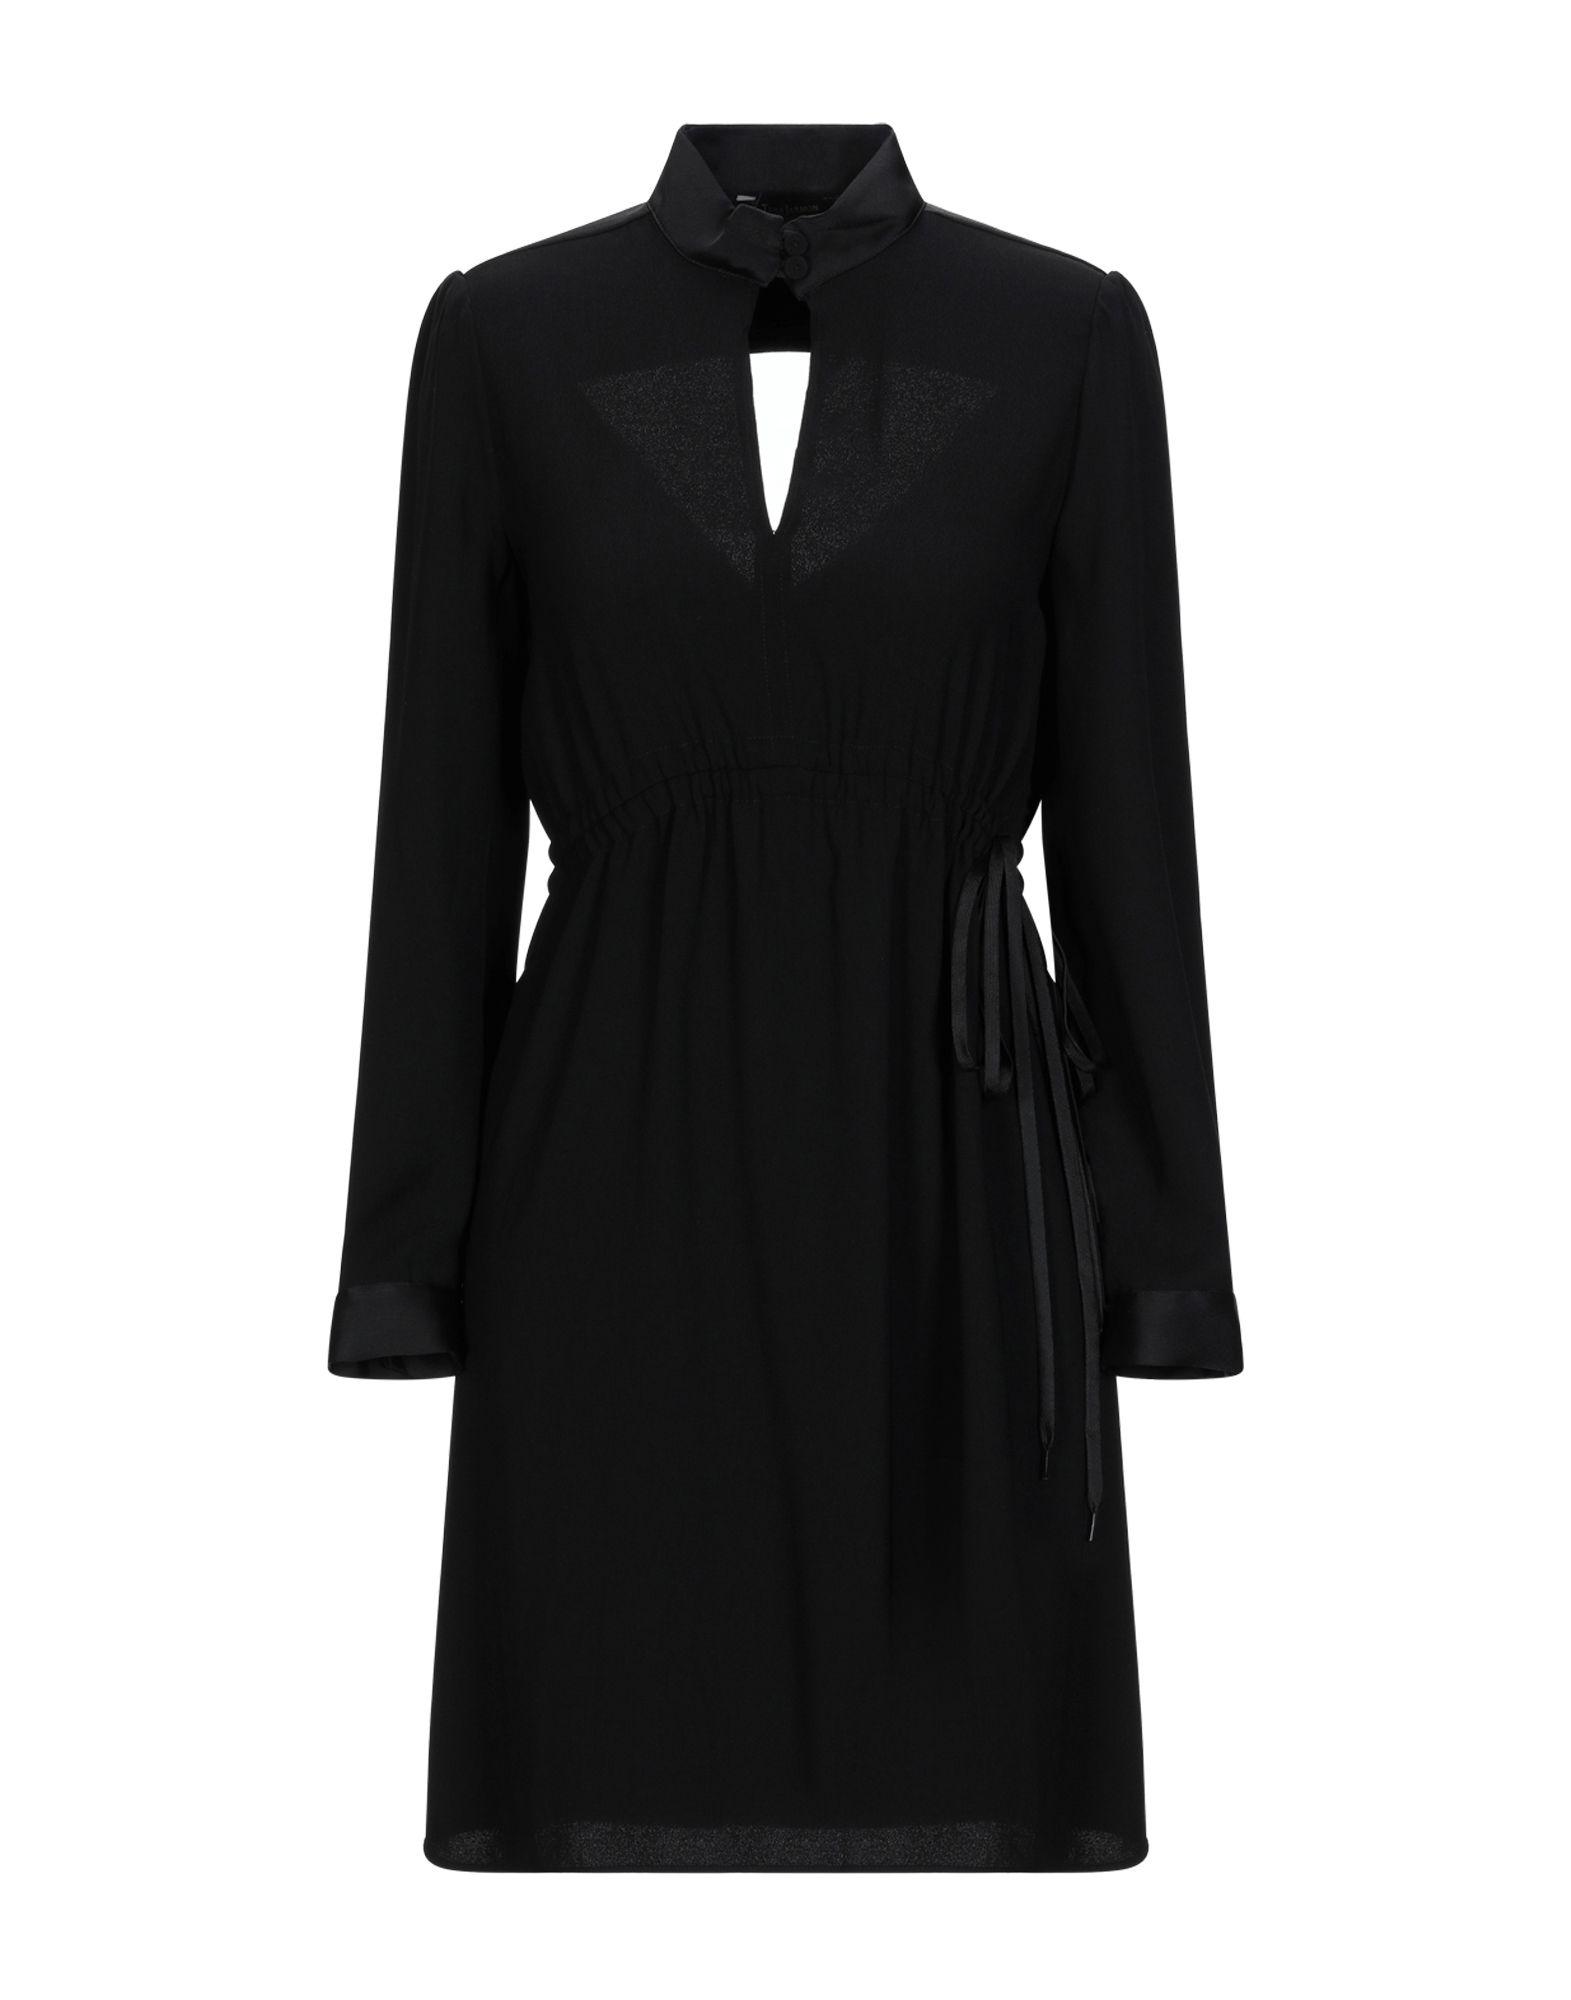 TARA JARMON Короткое платье платье рубашка fox yulia sway платье рубашка fox